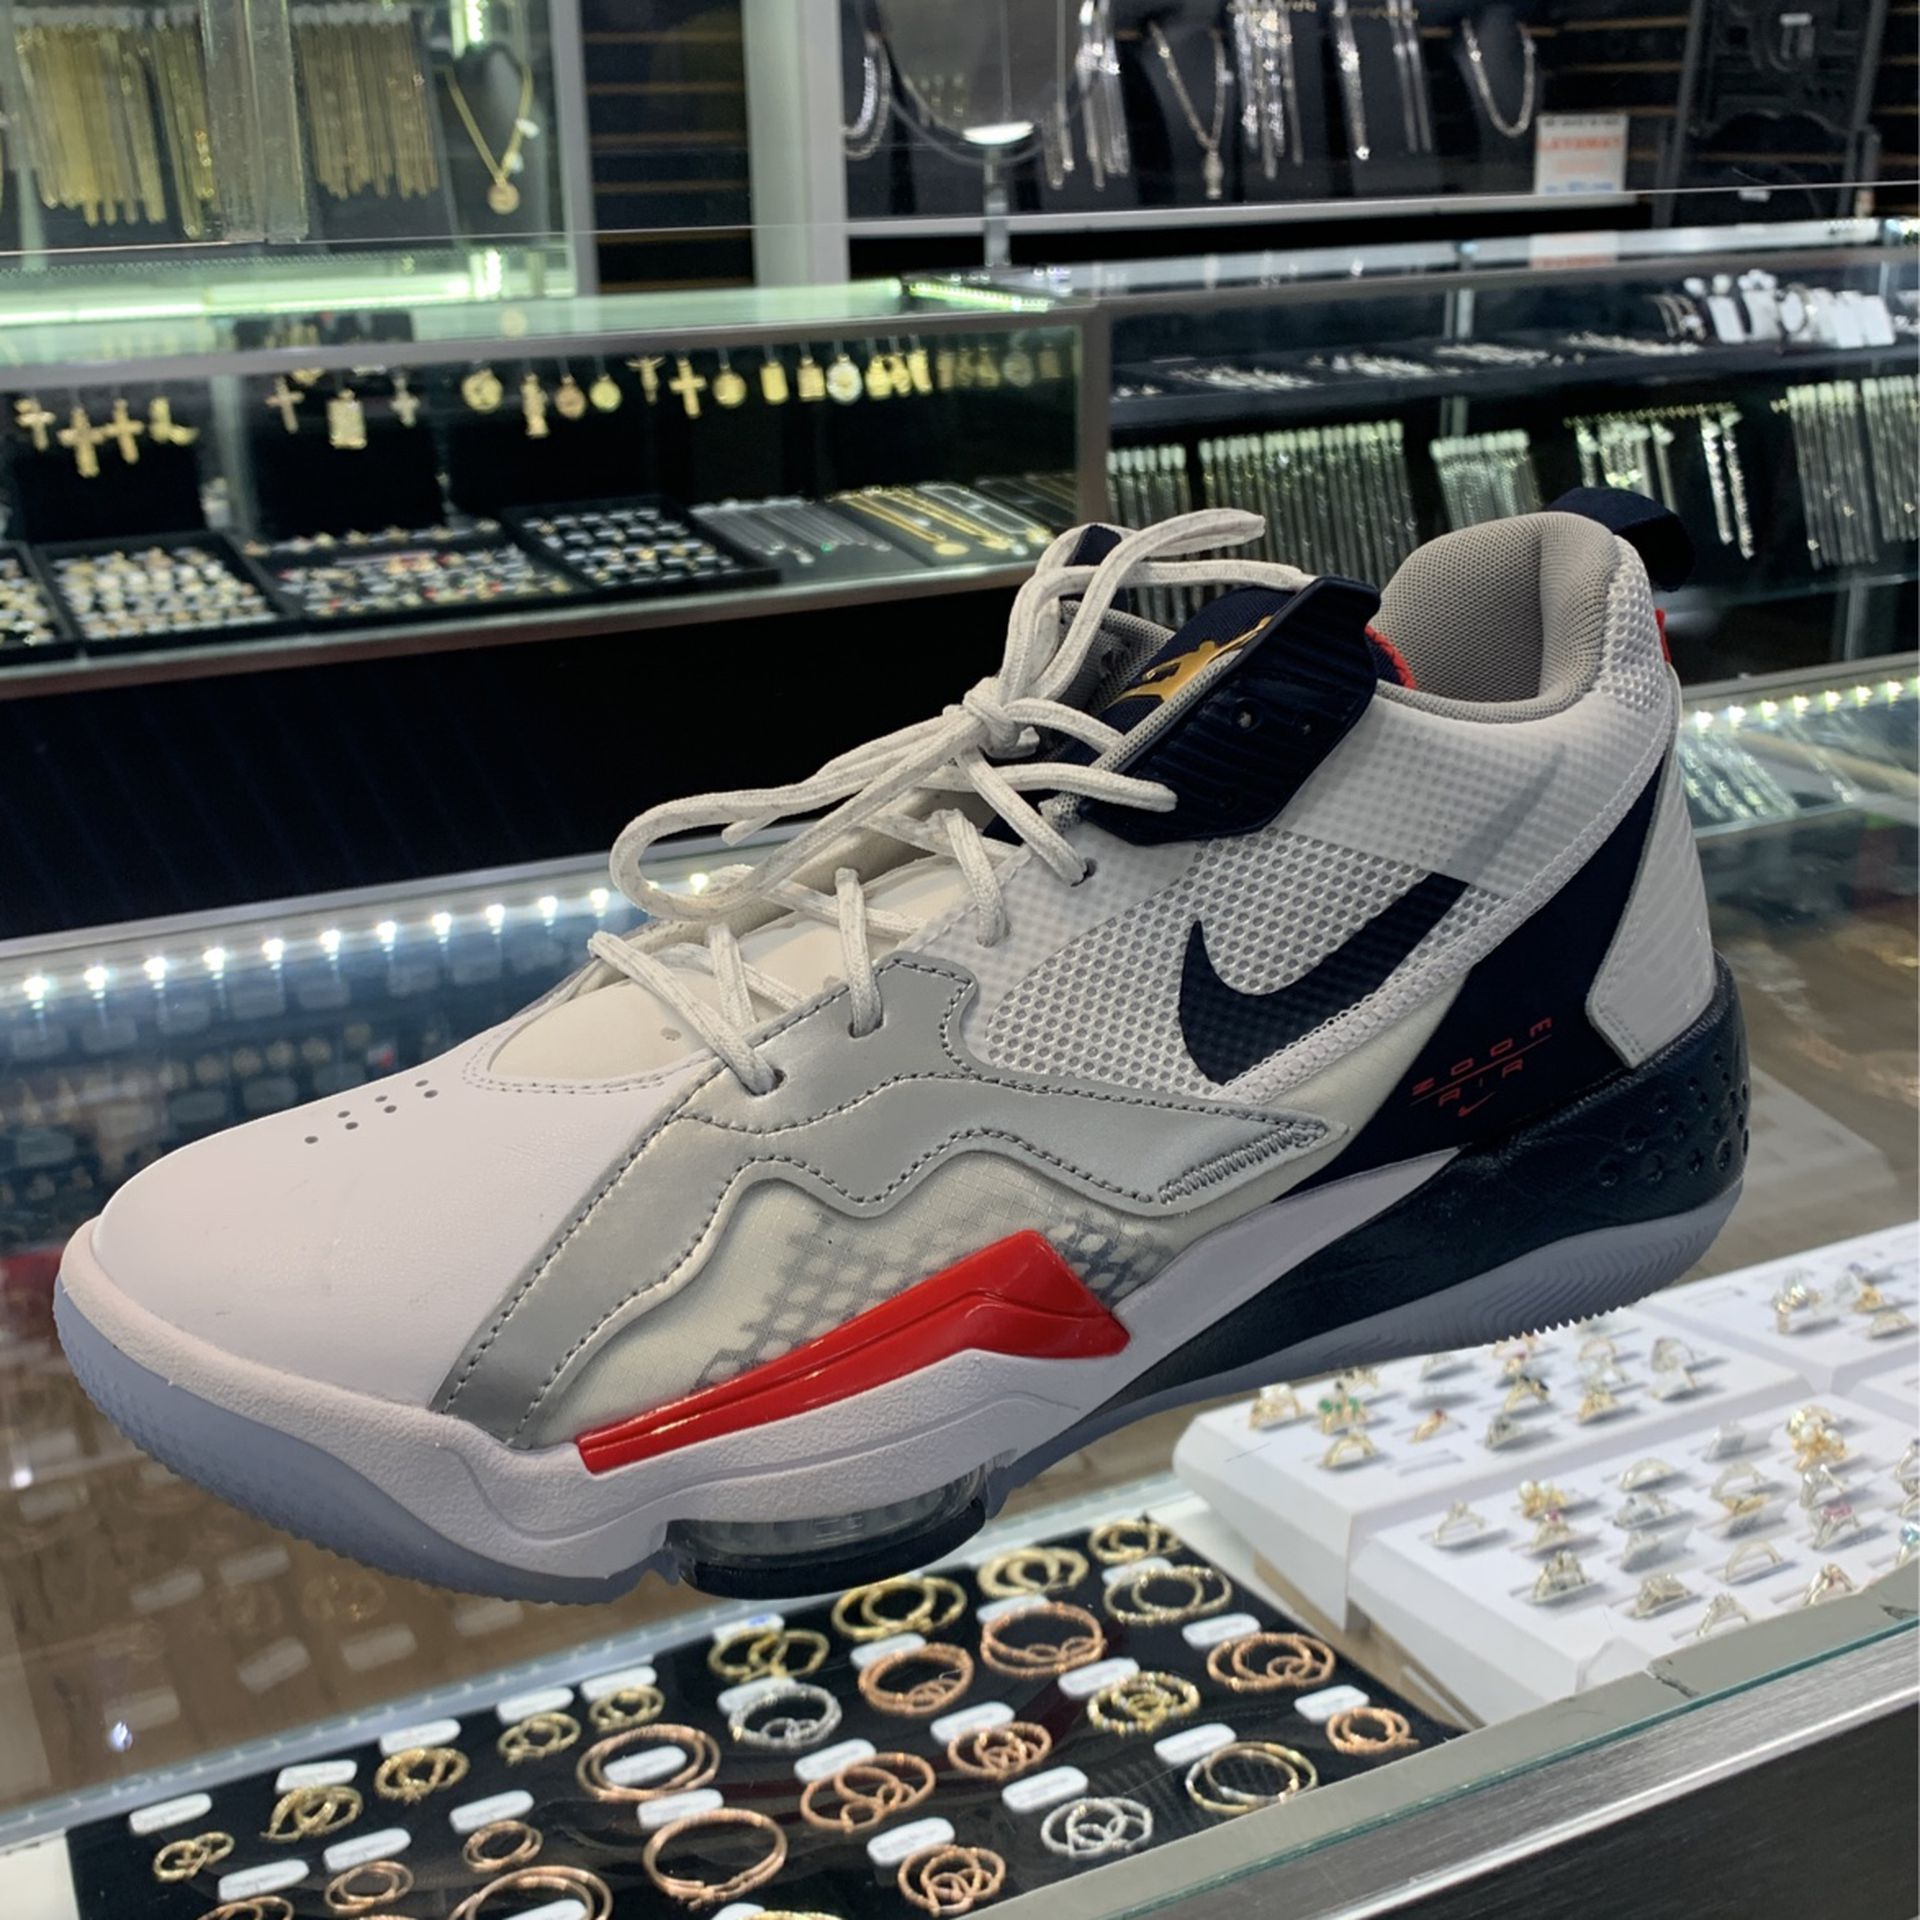 Jordan Zoom 92 Olympics Shoes  126096